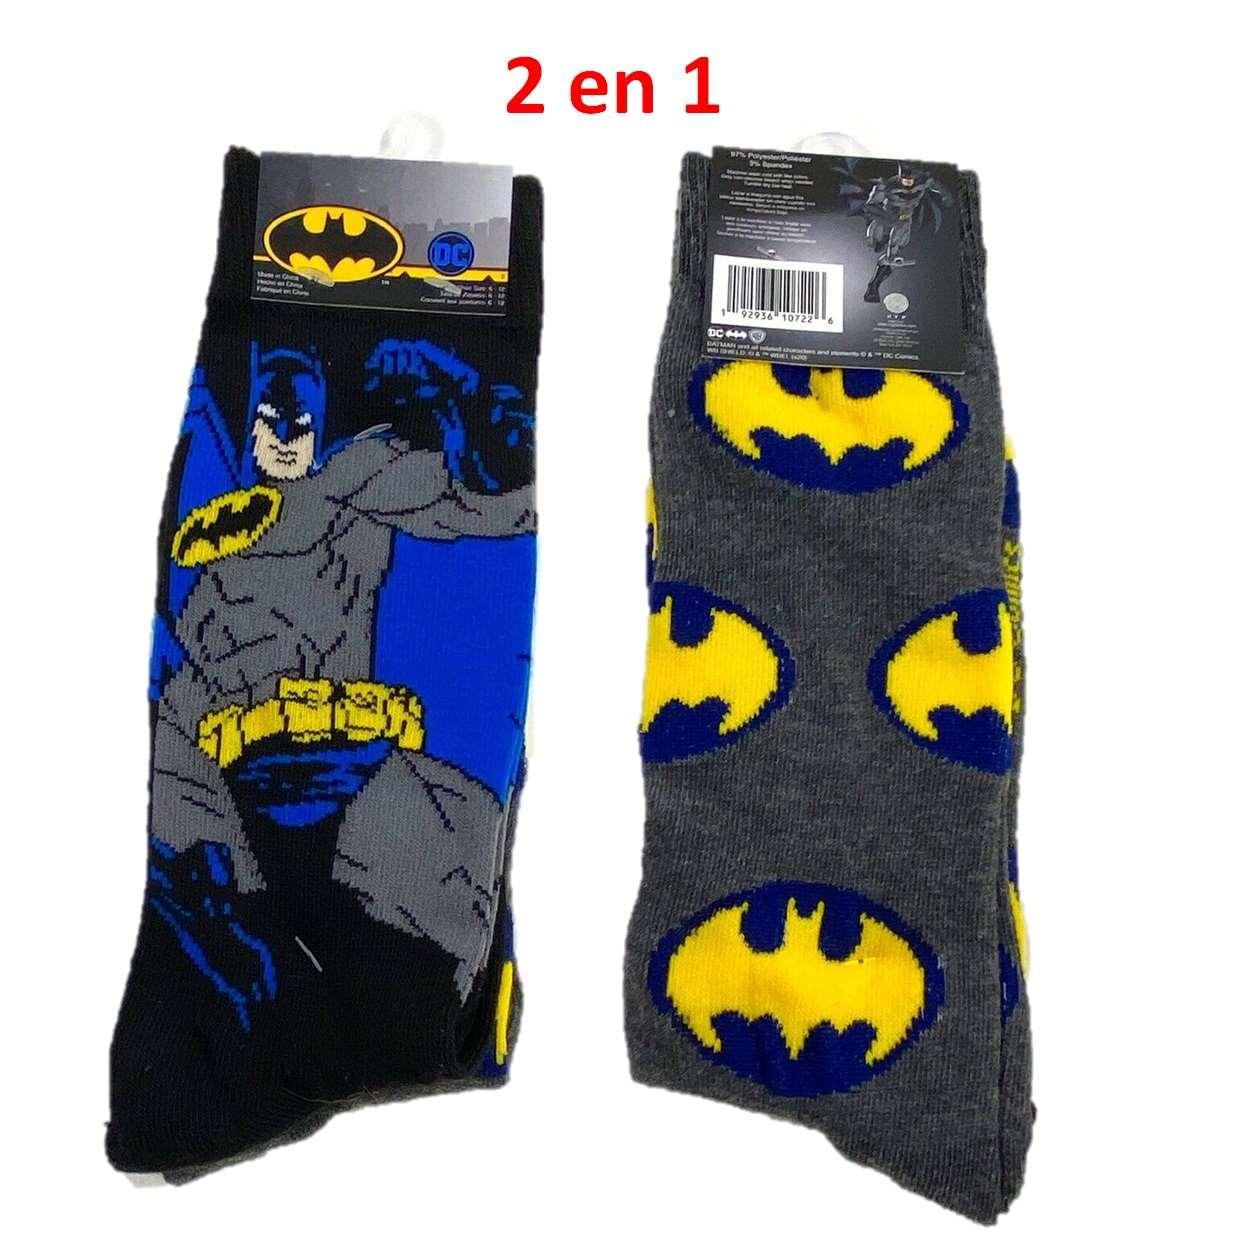 Pack 2 En 1 Calcetin (socks) Dc Batman 6/12 Hyponline